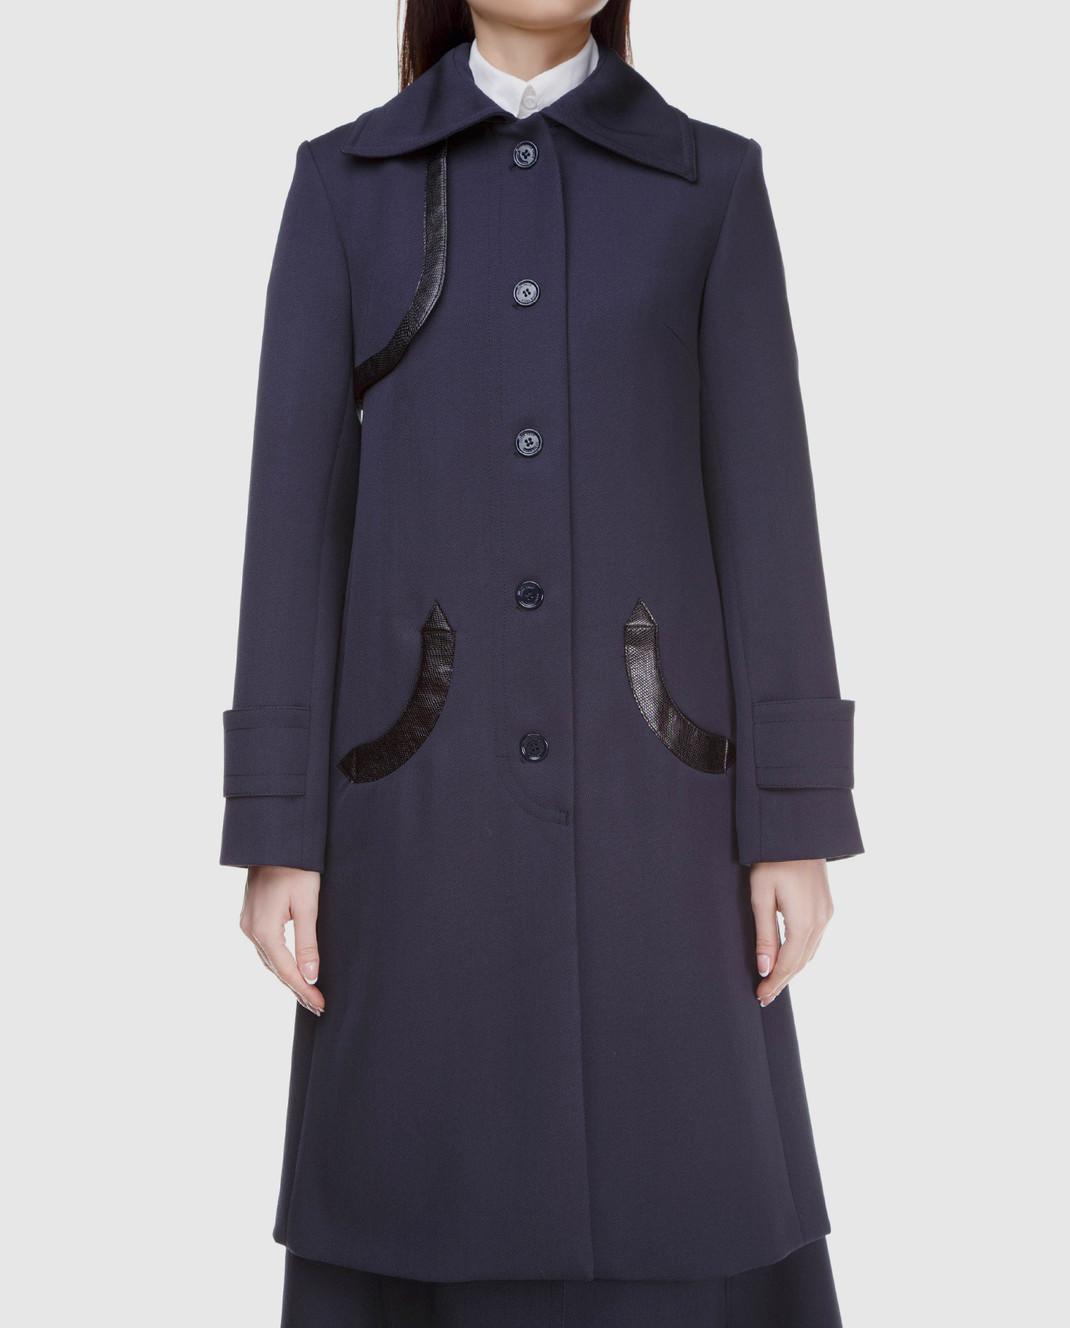 NINA RICCI Темно-синее пальто из шерсти 17HCMA016WV0220 изображение 3